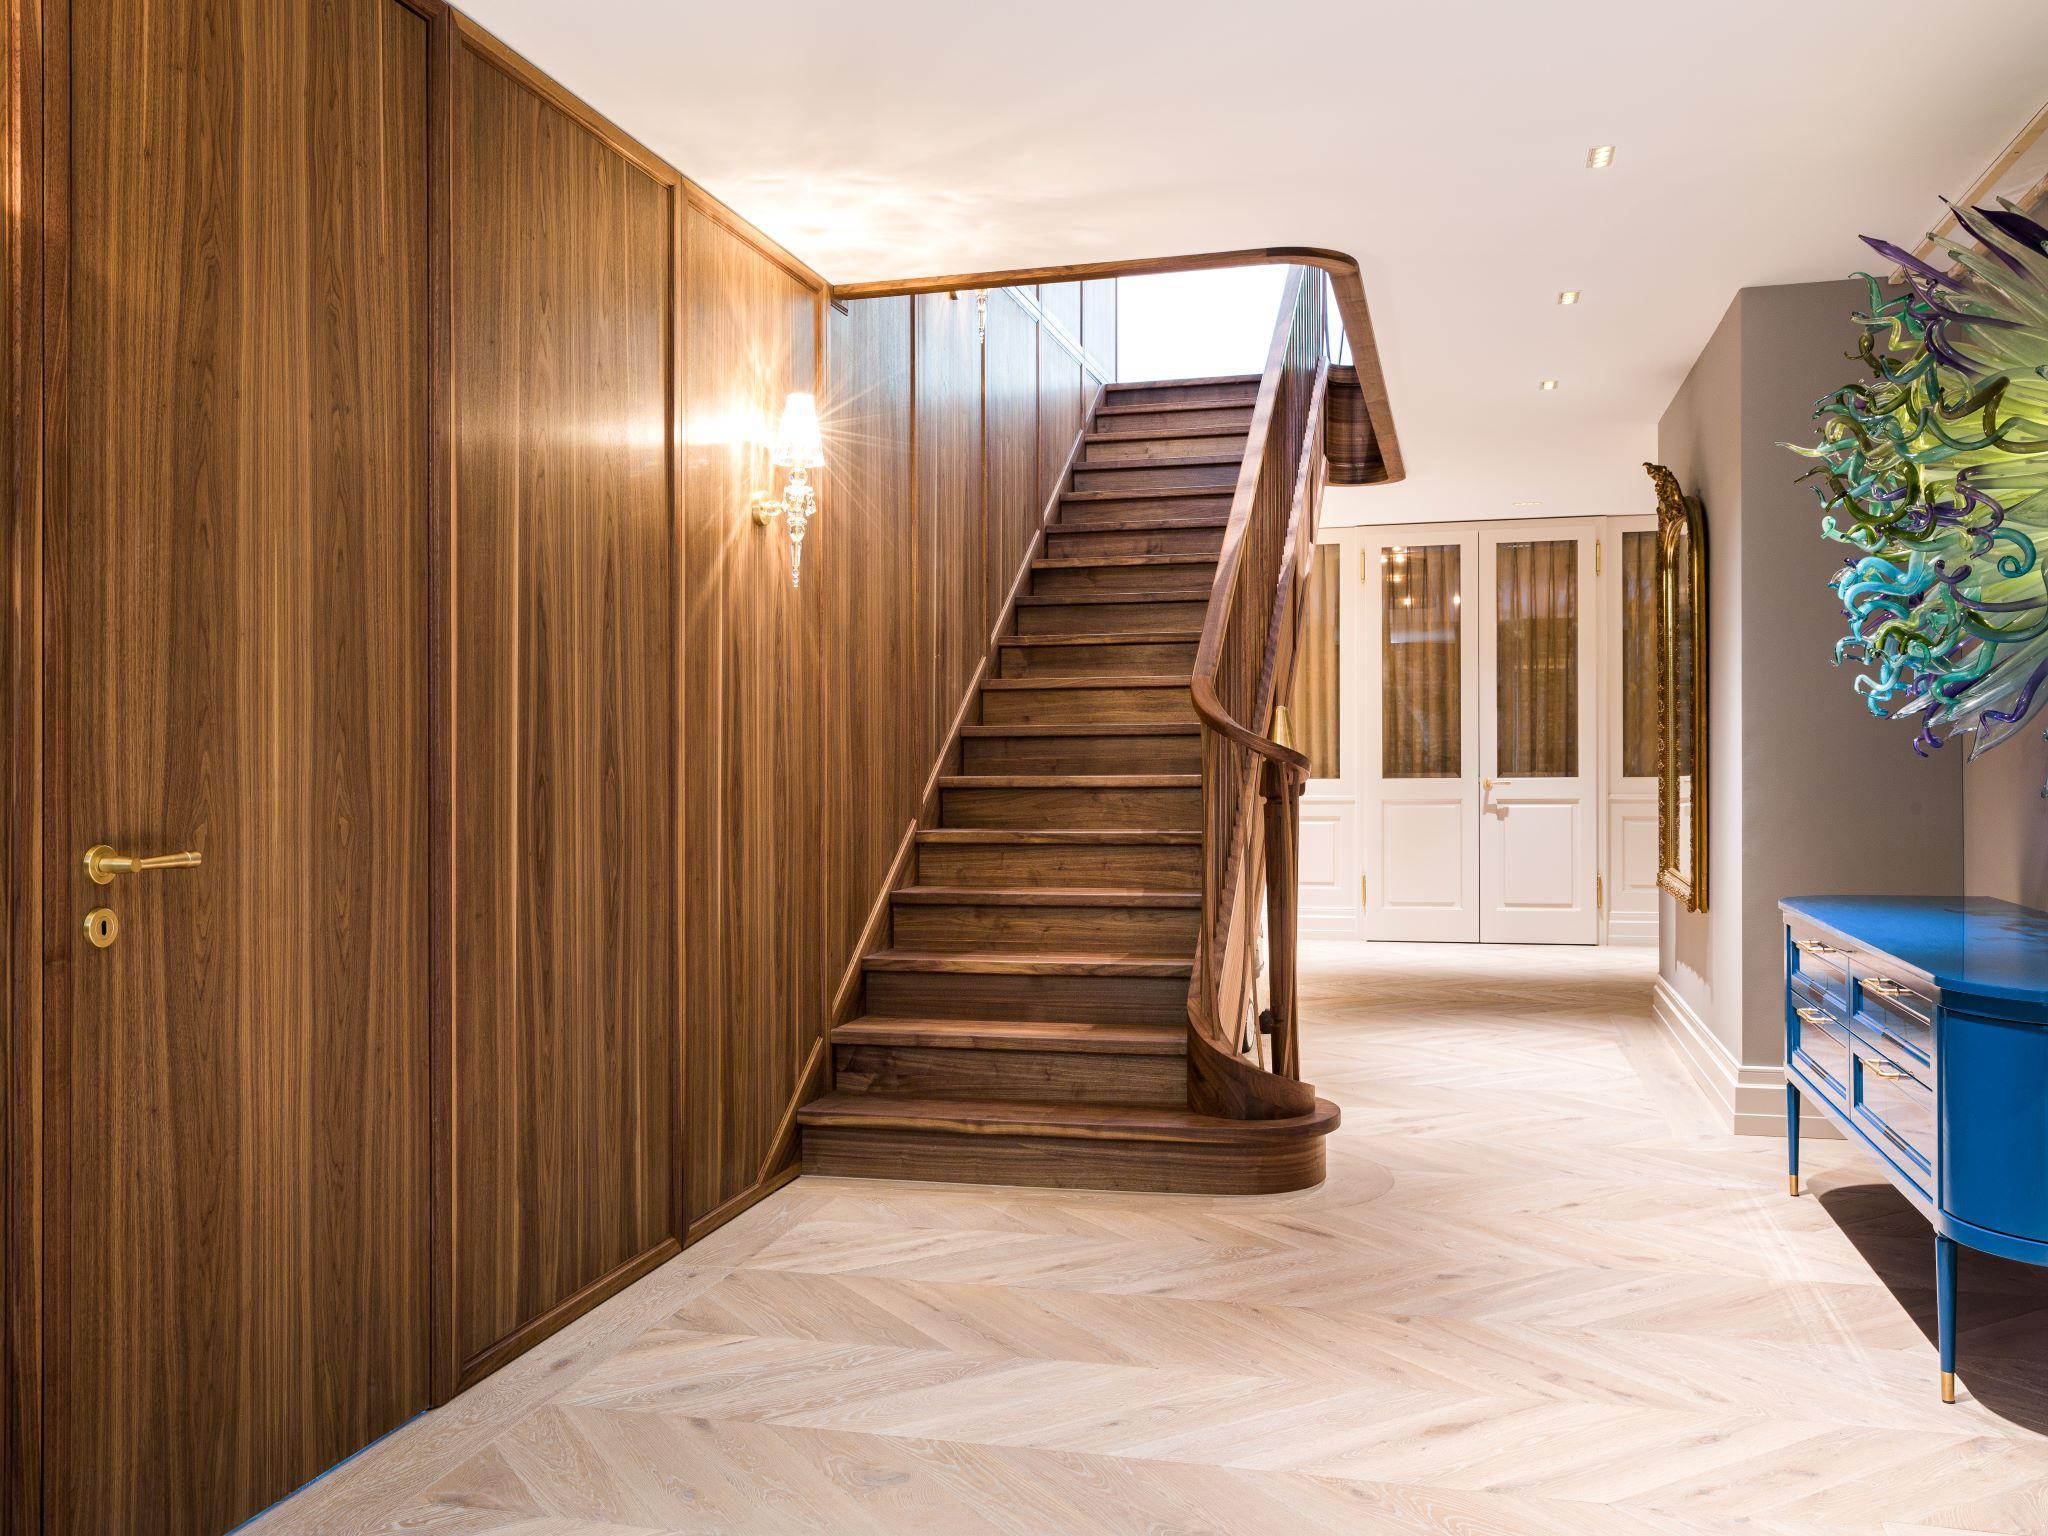 Stair Image 2319